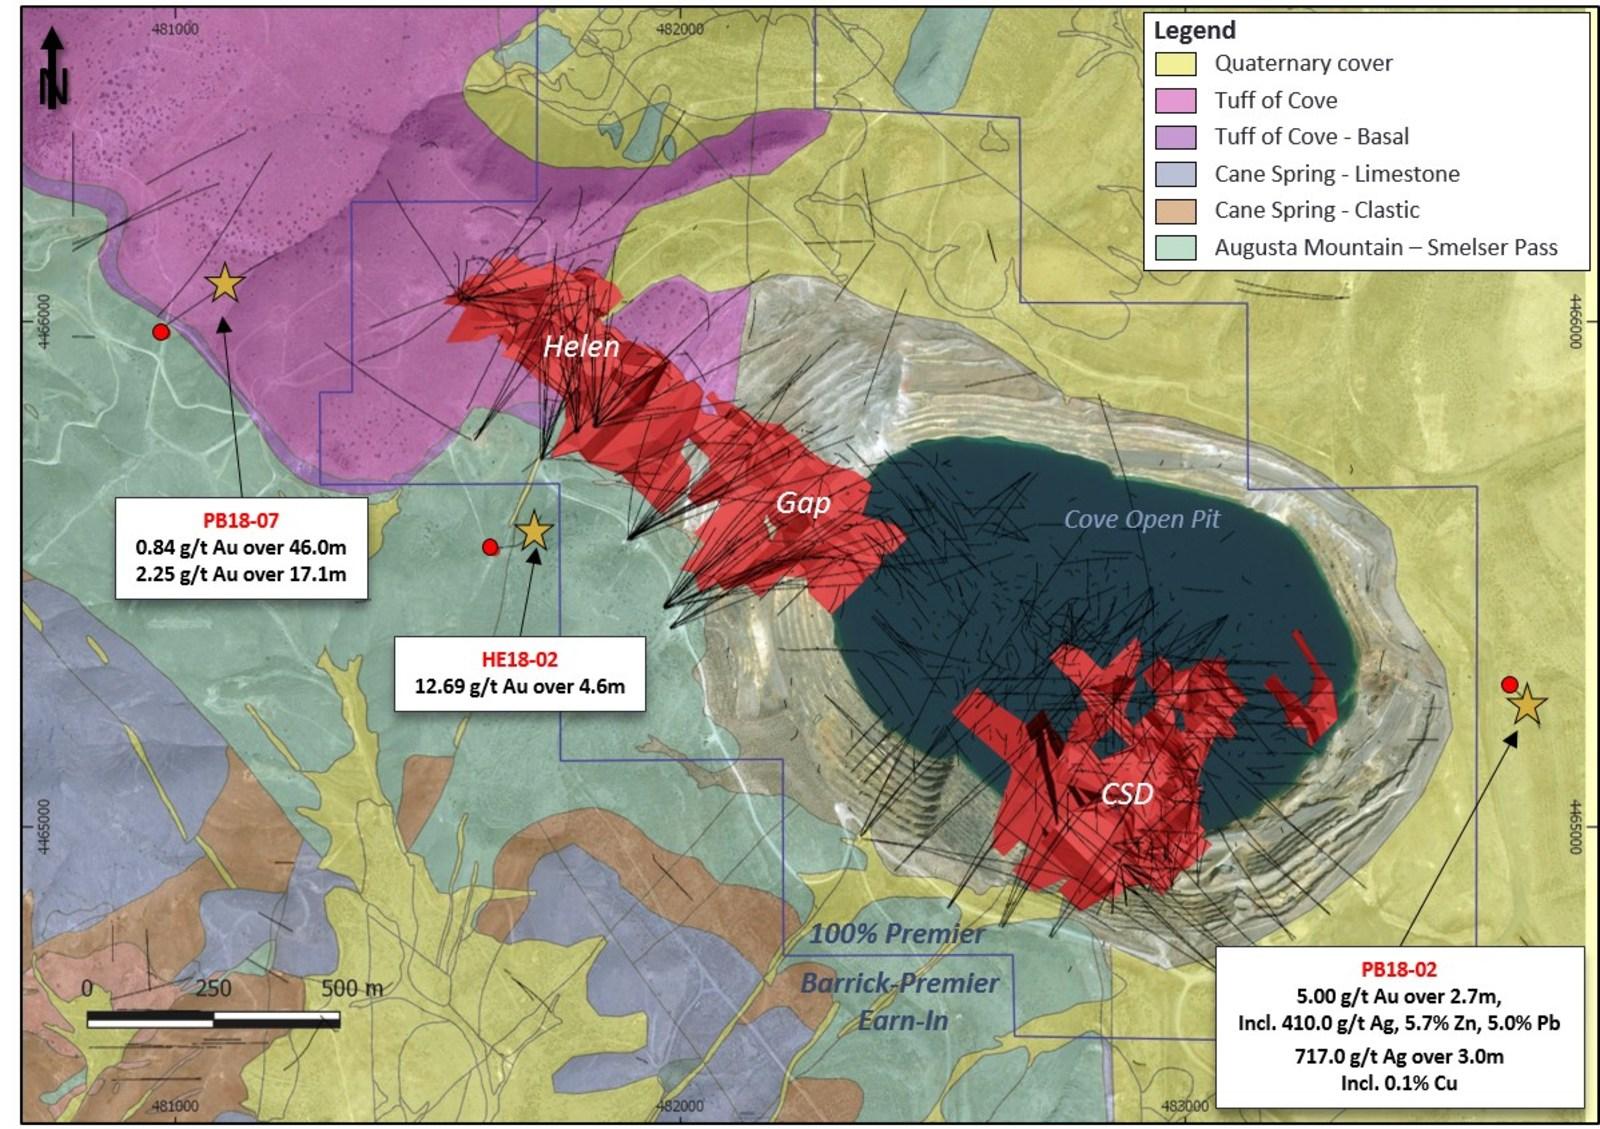 Figure 1 – McCoy-Cove highlight drill intercept locations